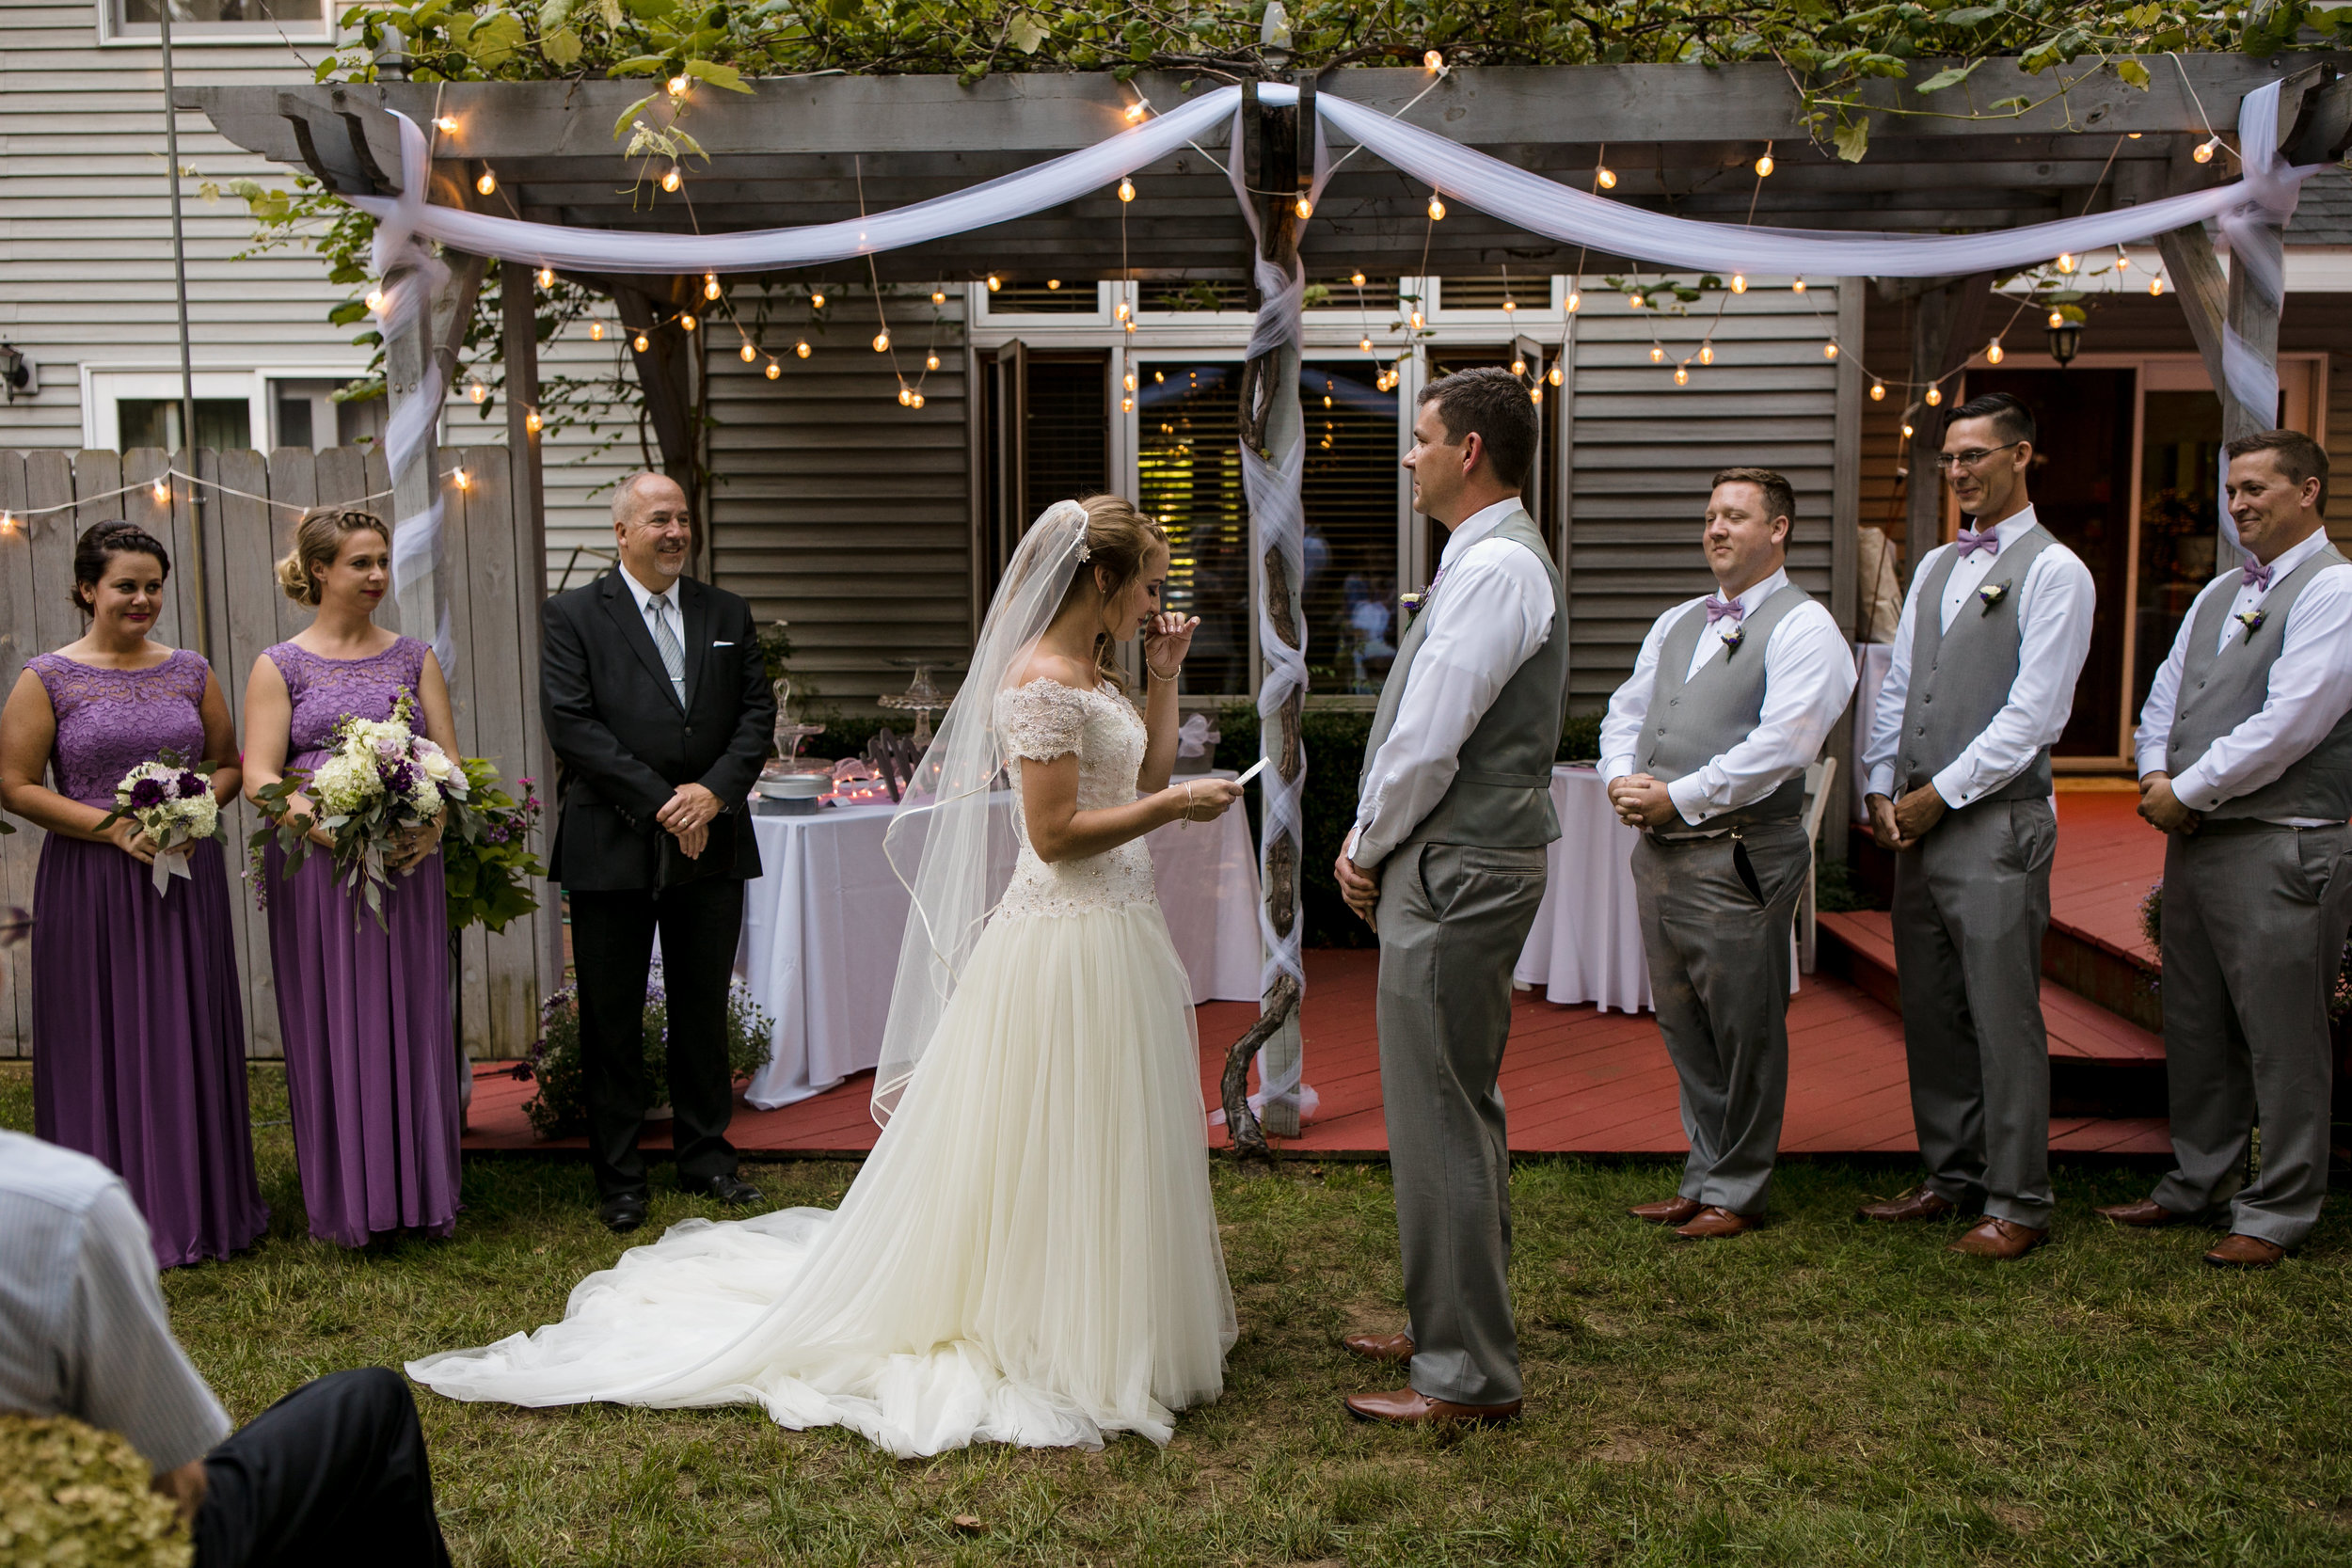 ludington-michigan-intimate-backyard-wedding-jessica-nolan275.jpg